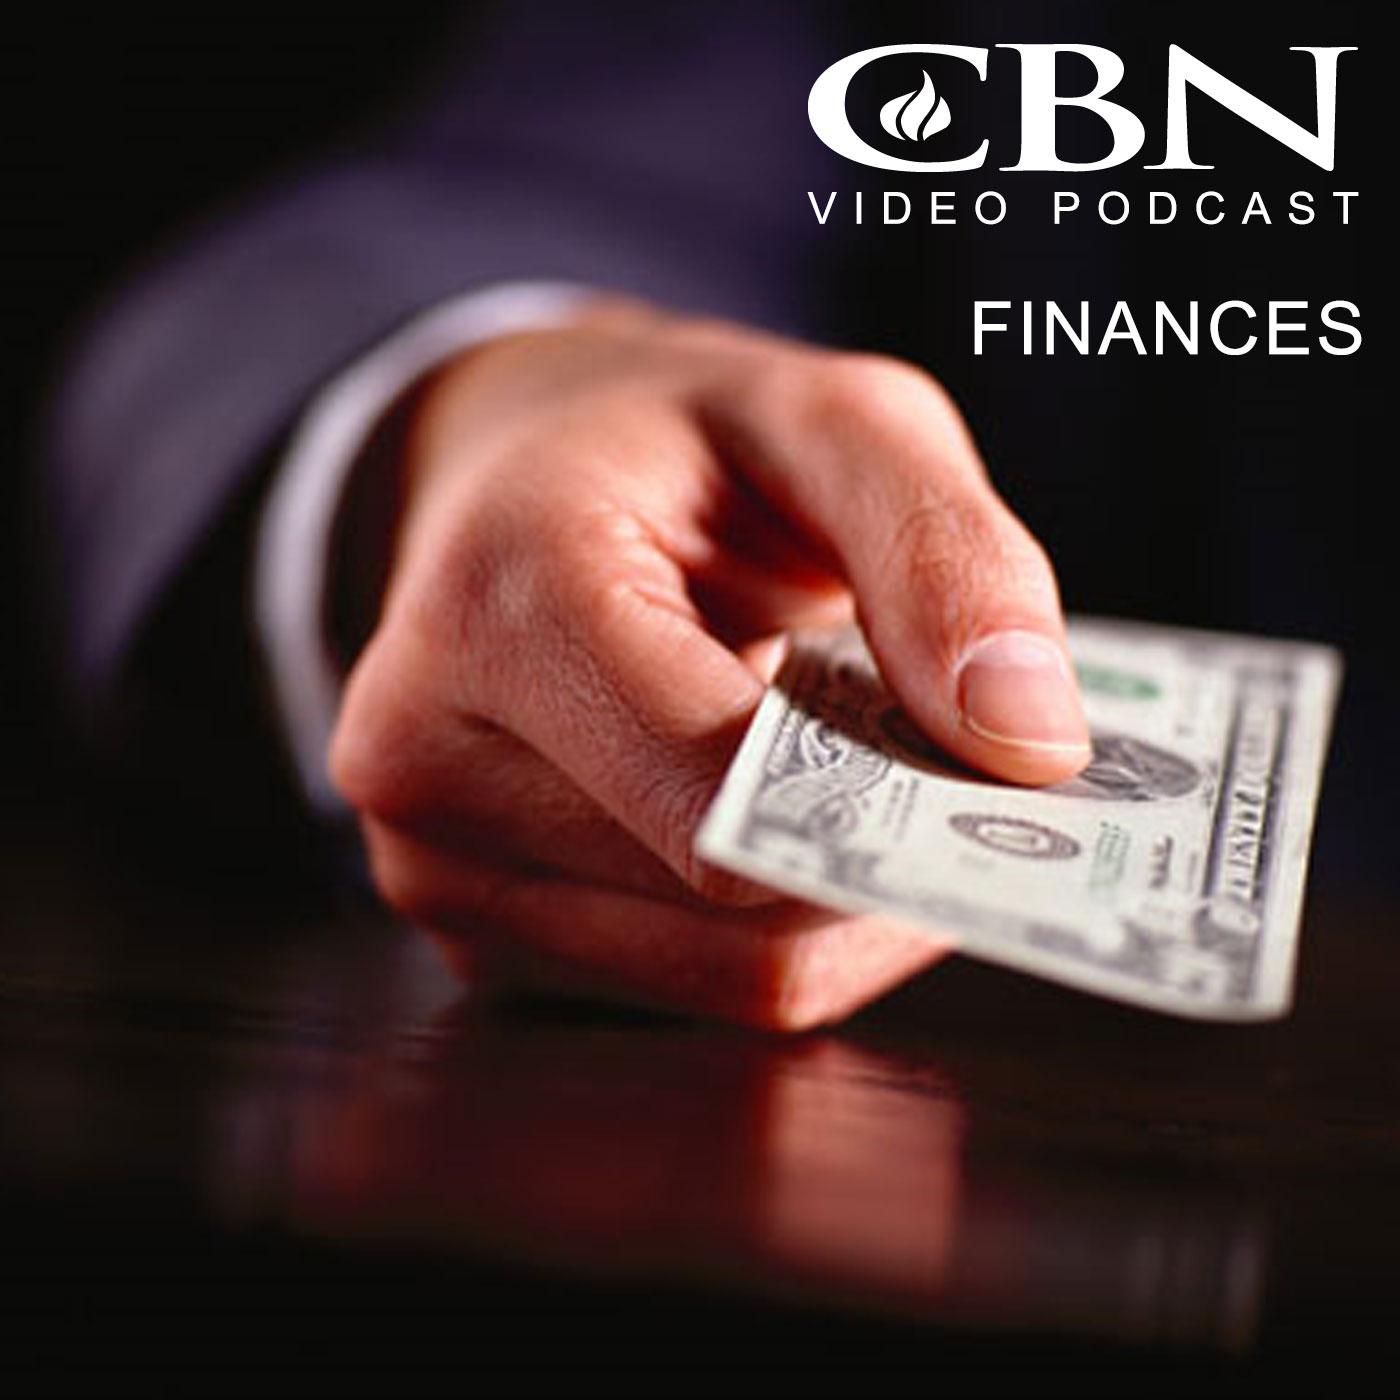 <![CDATA[CBN.com - Finances - Video Podcast]]>